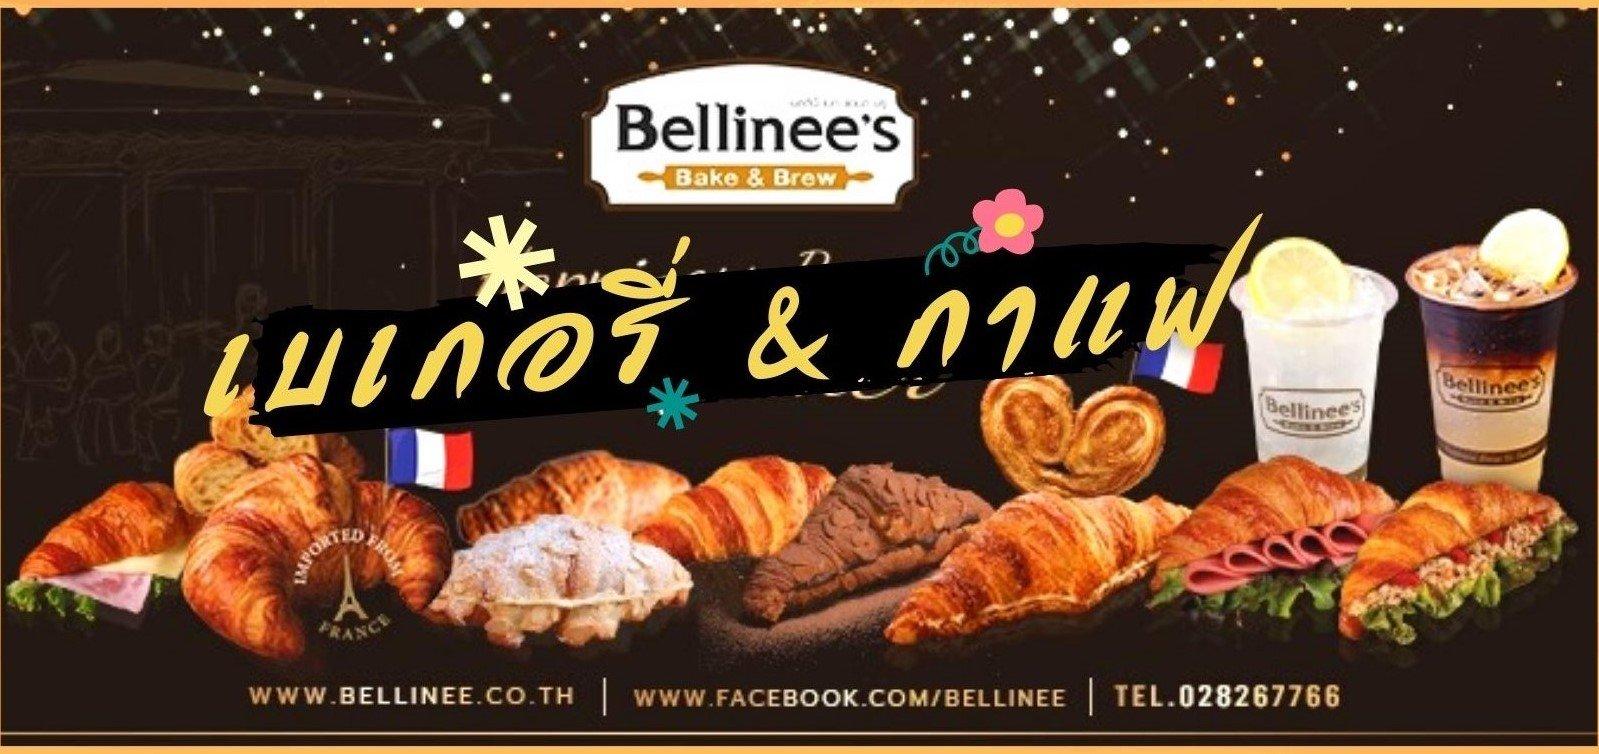 Bellinee's Bake & Brew   ร้านเบเกอรี่และกาแฟระดับพรีเมี่ยมในบรรยากาศอบอุ่นสไตล์อิตาลี